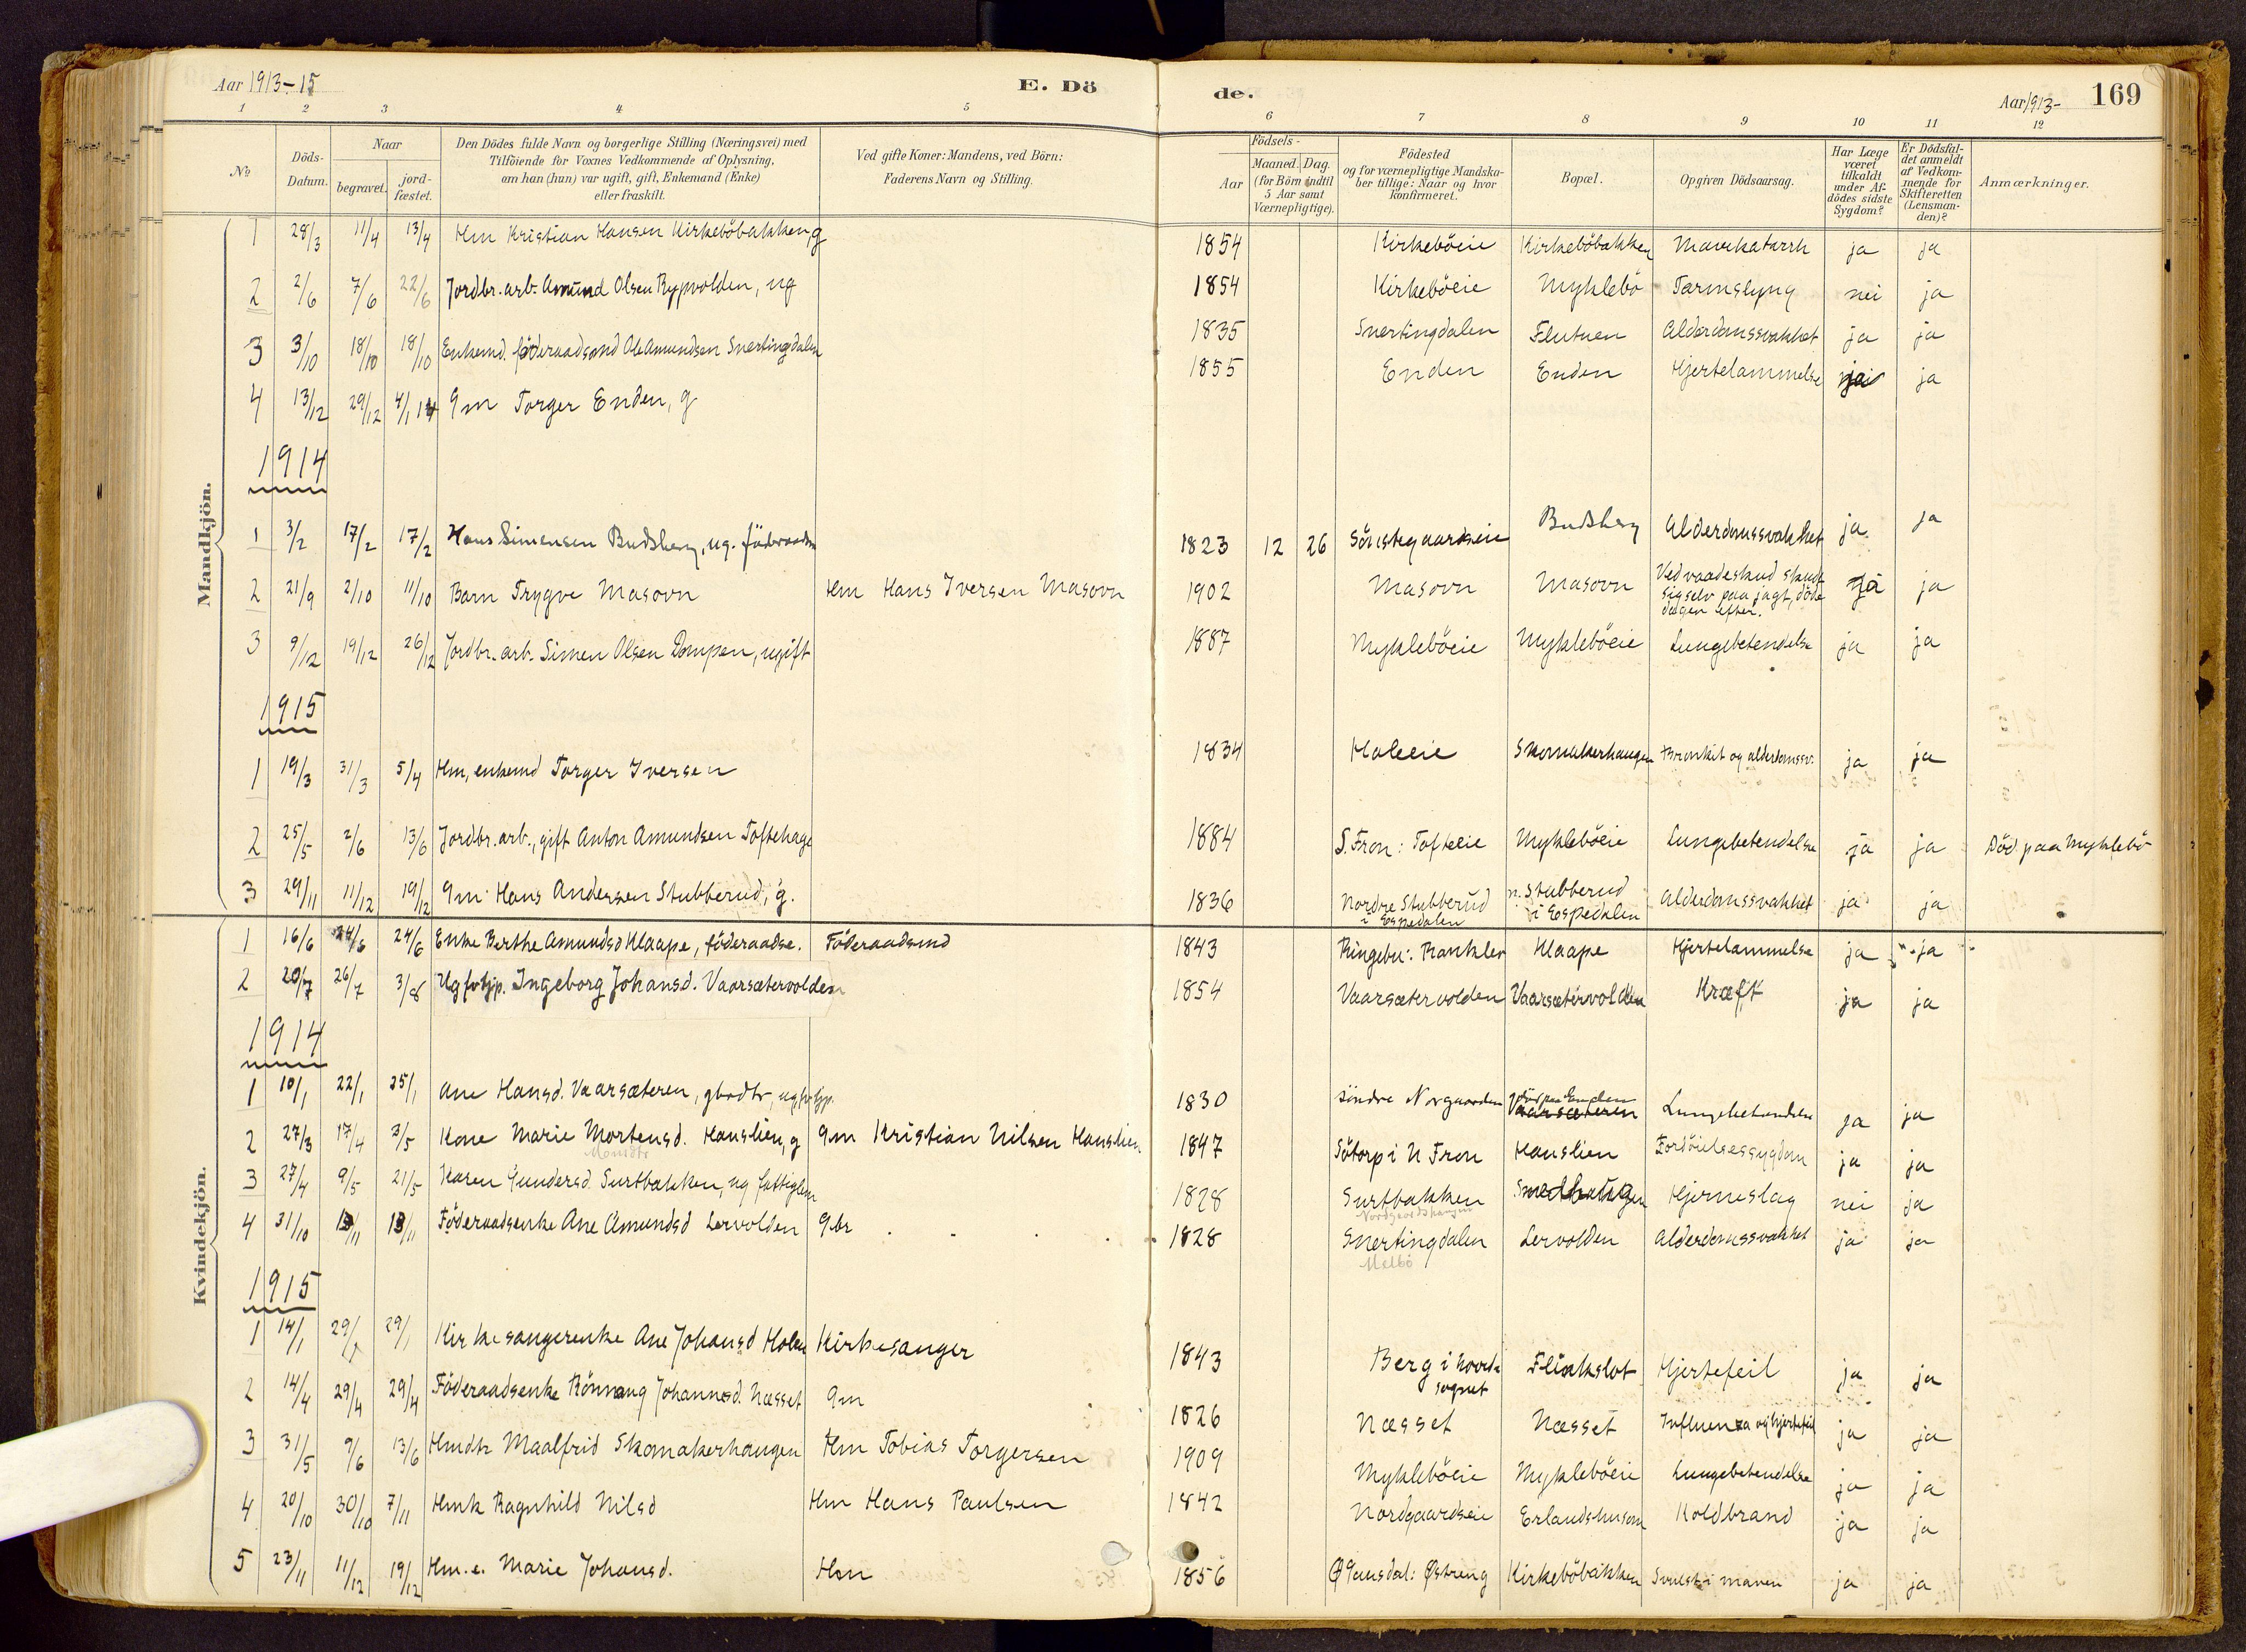 SAH, Vestre Gausdal prestekontor, Ministerialbok nr. 2, 1887-1918, s. 169